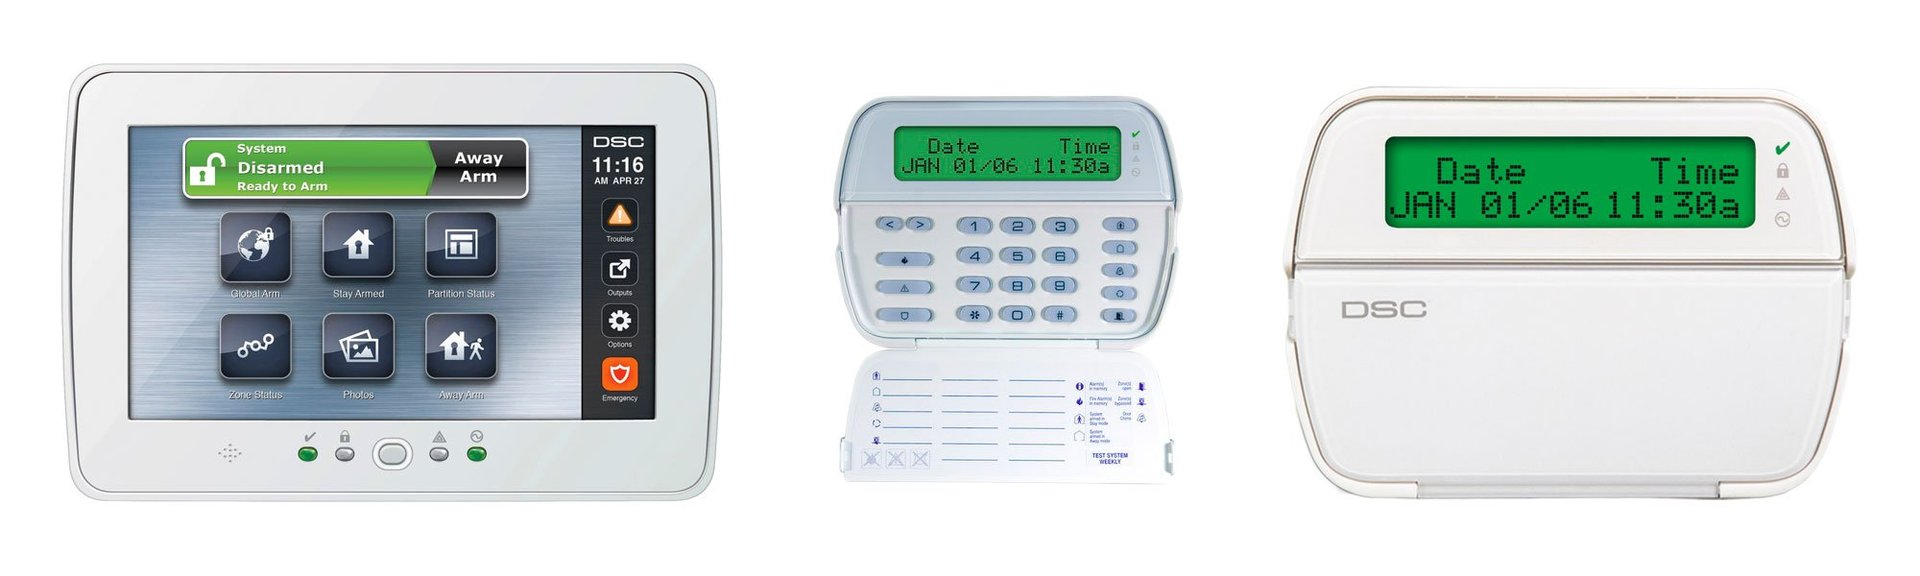 Residential Alarm System